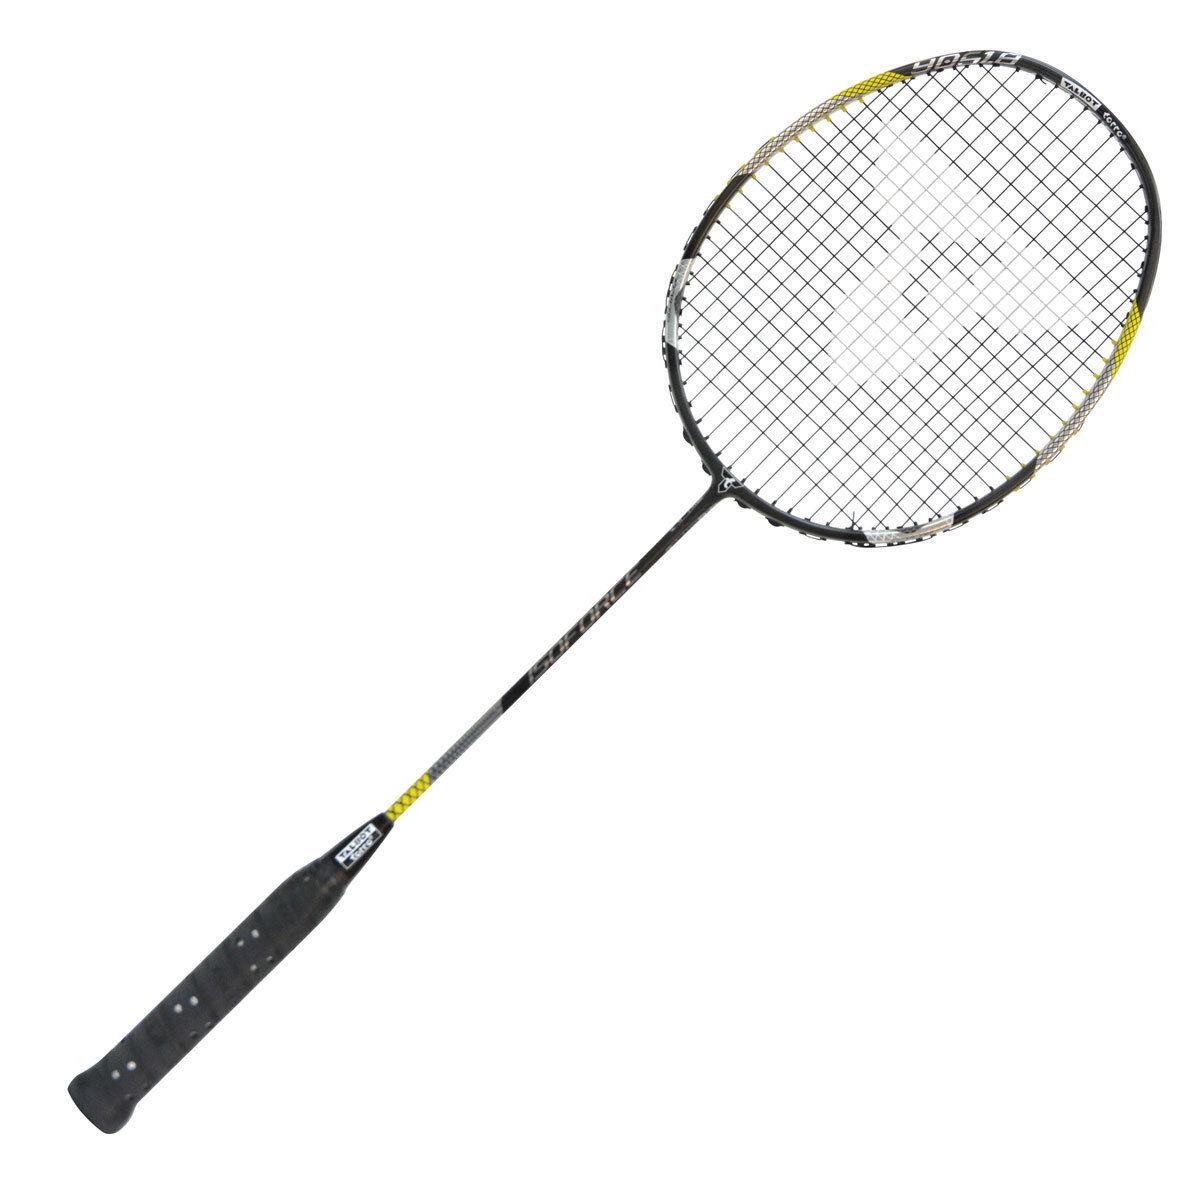 TALBOT TORRO ISOFORCE 9051.8 Badmintonschläger Badminton Racket Racket Racket Schläger 439933 82cd03